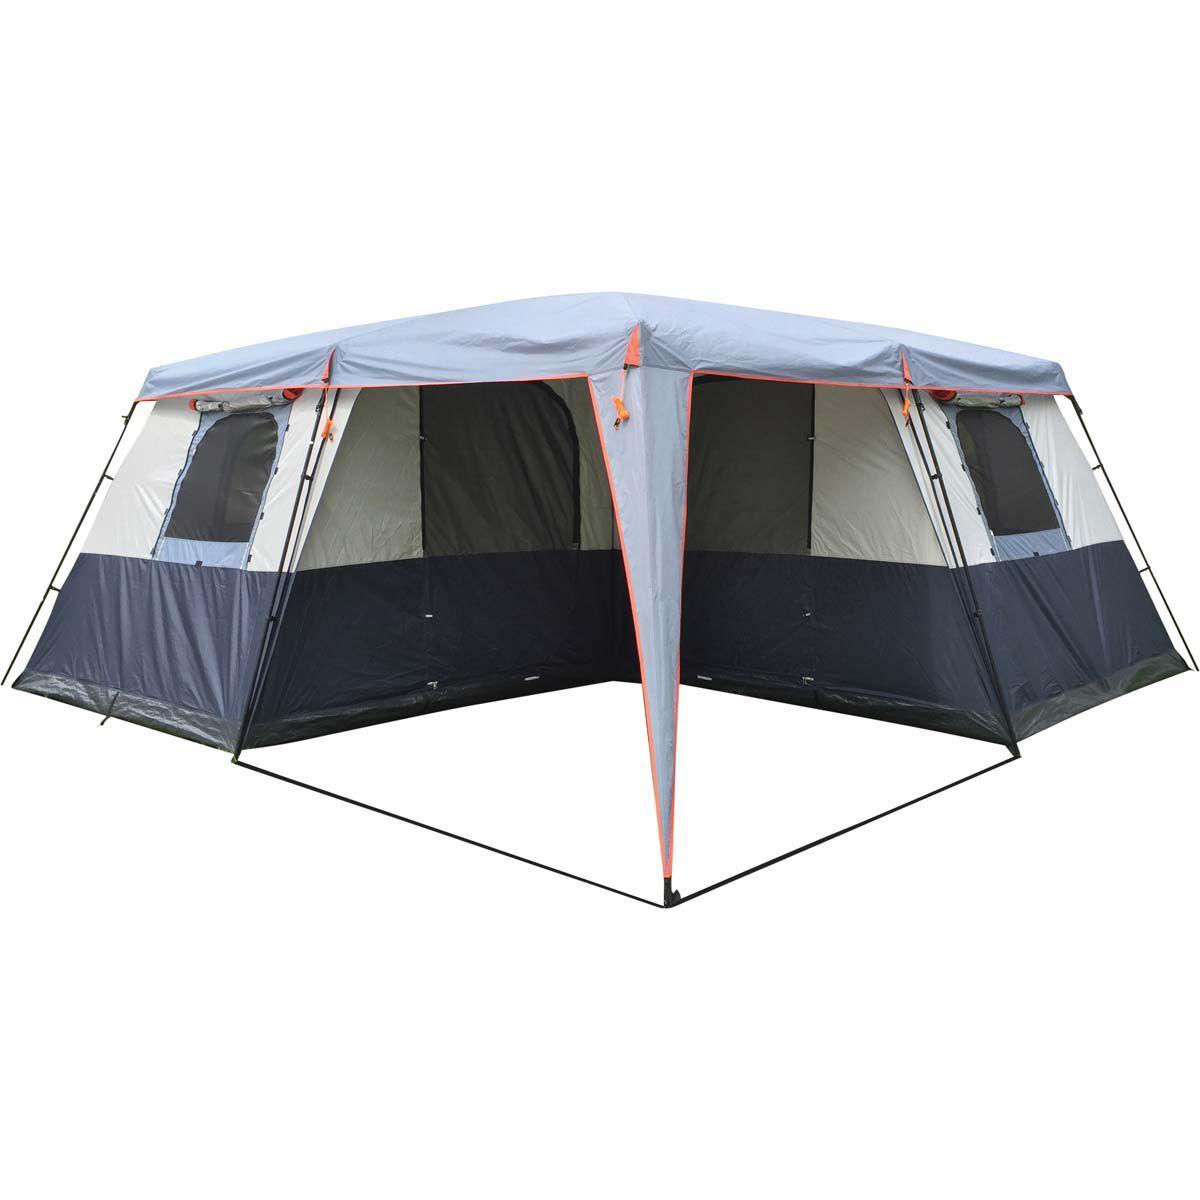 Wanderer Manor Dome Tent 12 Person  bcf_hi-res ...  sc 1 st  BCF Australia & Dome Tents - Buy Online - BCF Australia